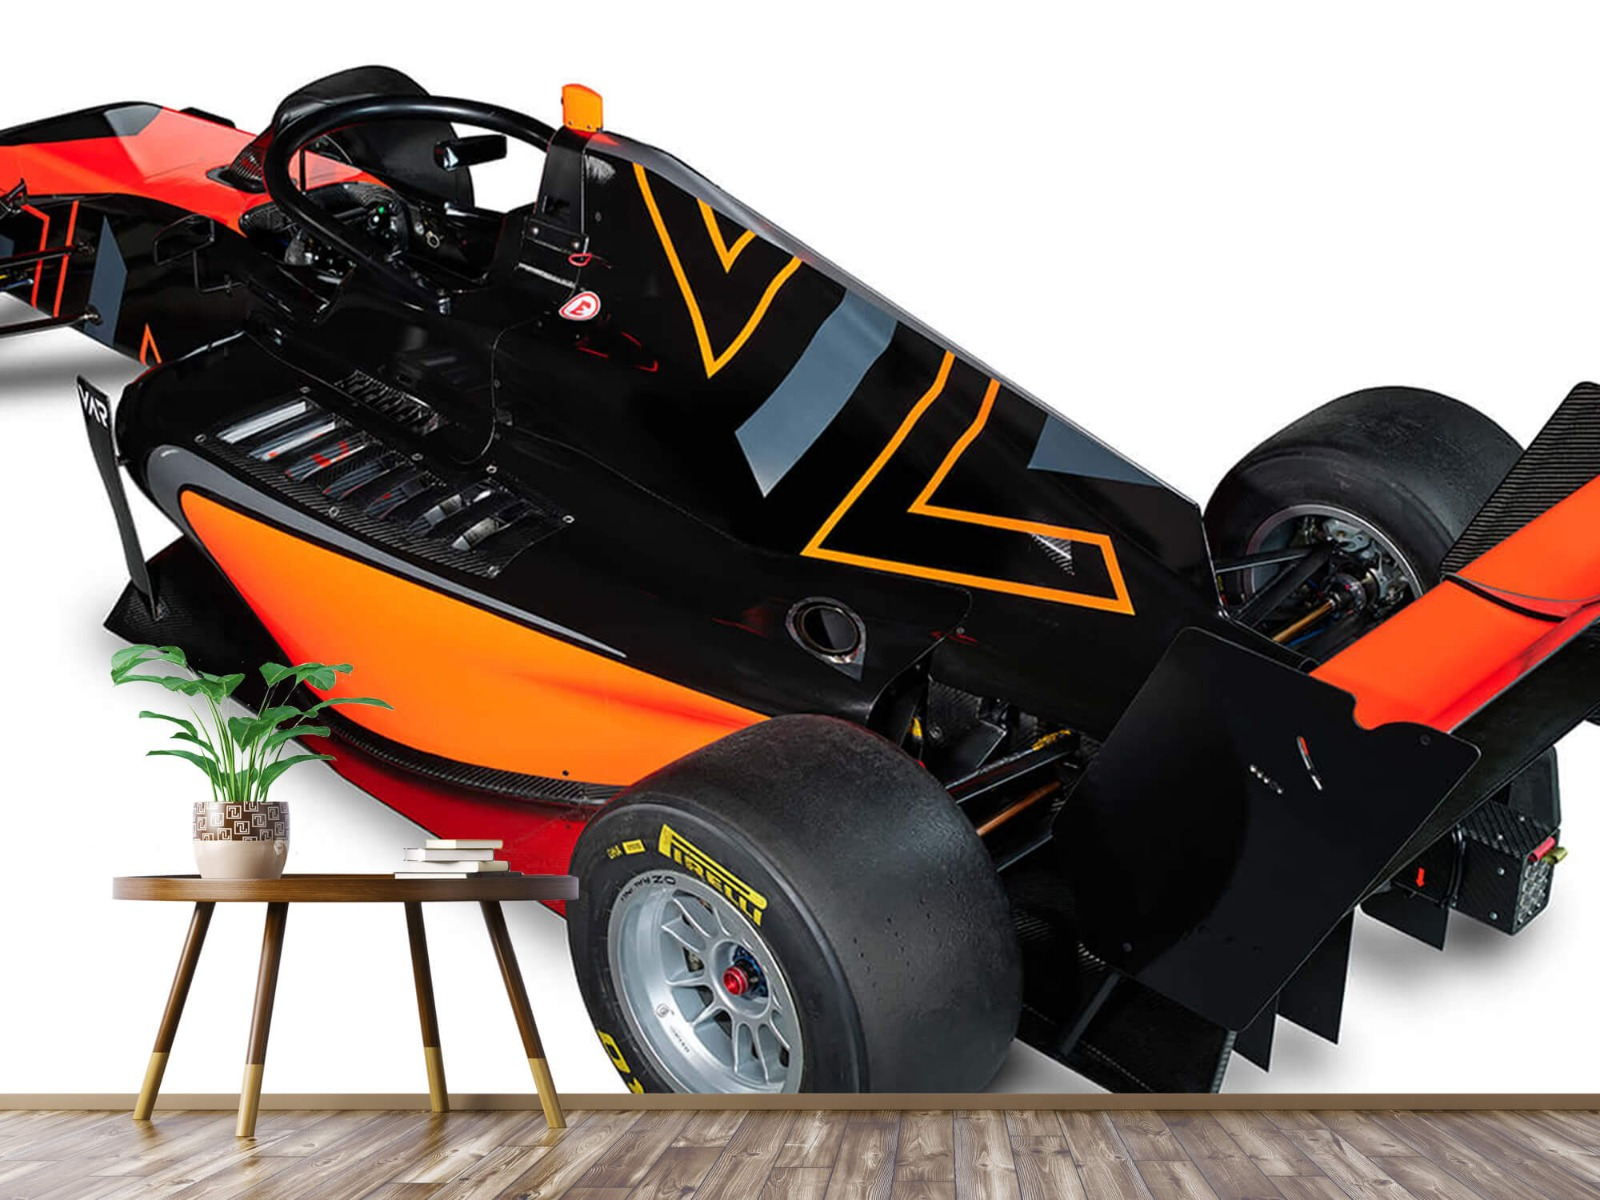 Sportauto's - Formula 3 - Rear left view - Hobbykamer 4